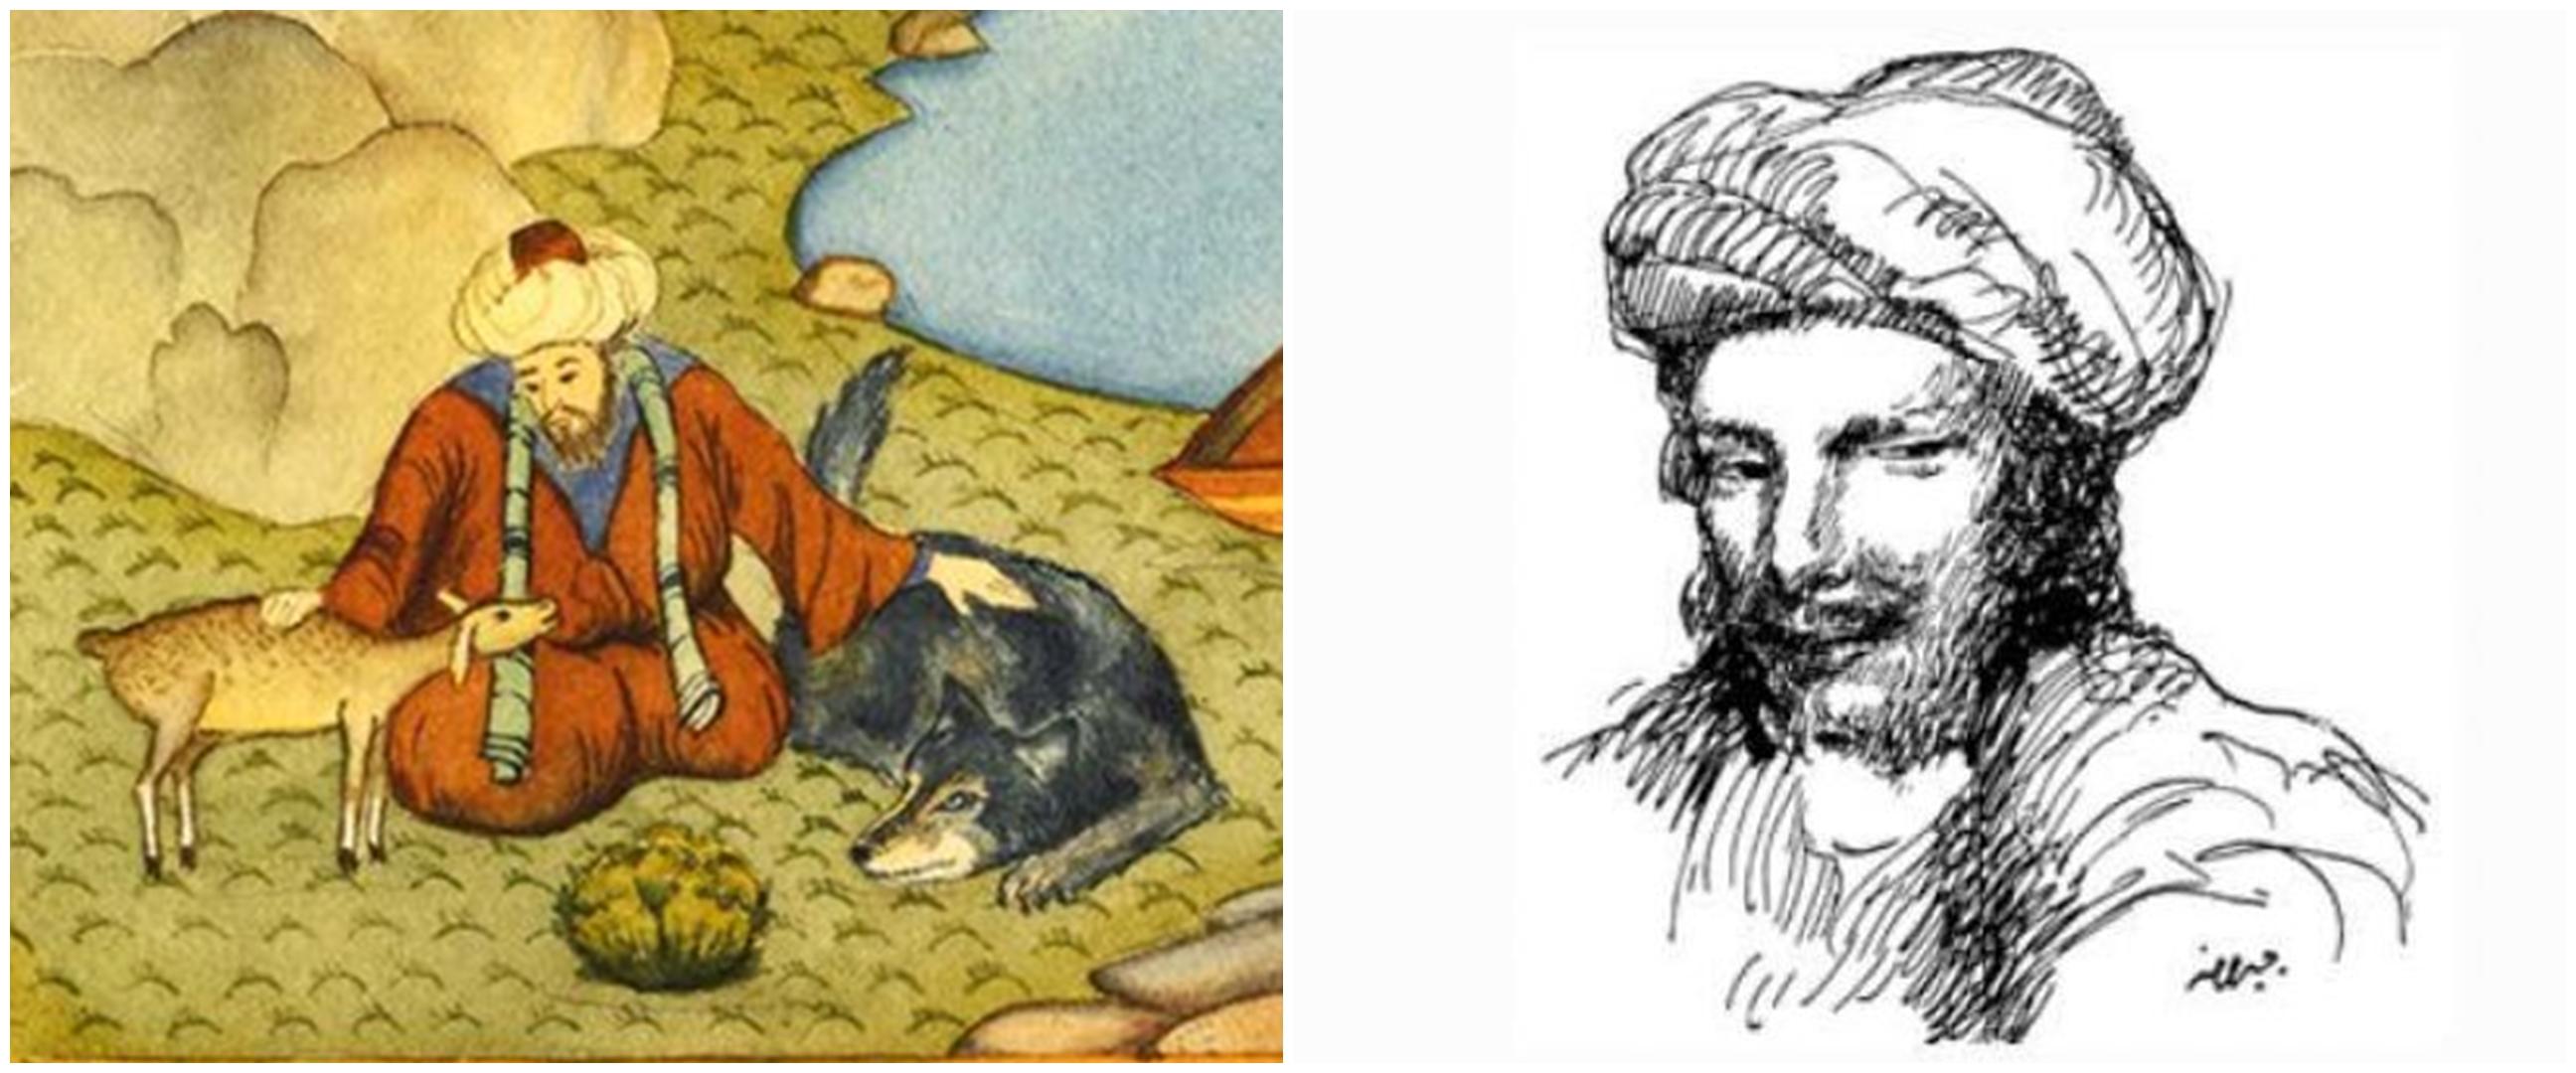 5 Cerita hikayat Abu Nawas yang menarik, singkat, jenaka, & bermakna